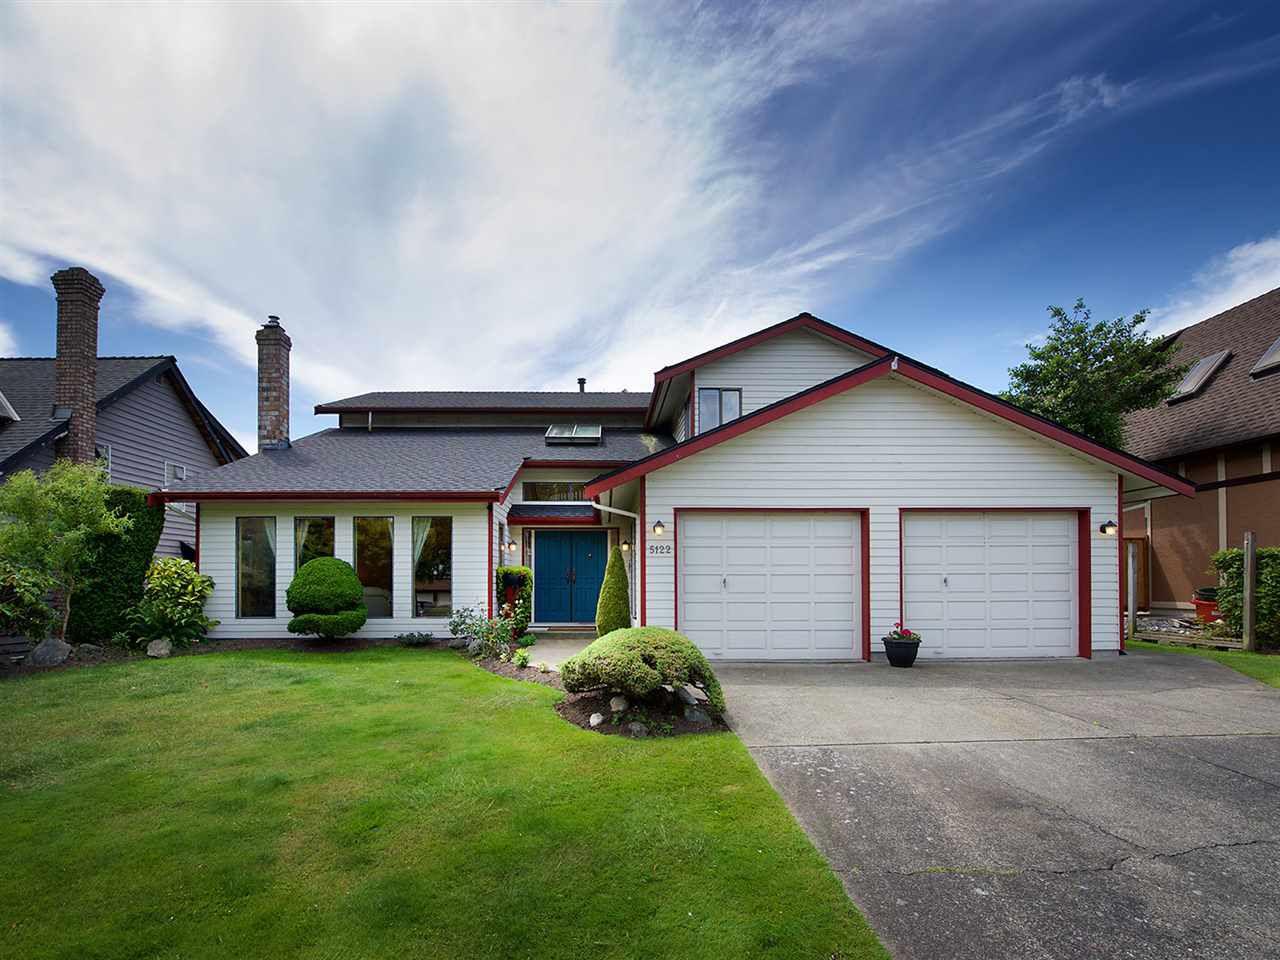 "Main Photo: 5122 2A Avenue in Delta: Pebble Hill House for sale in ""PEBBLE HILL"" (Tsawwassen)  : MLS®# R2077754"